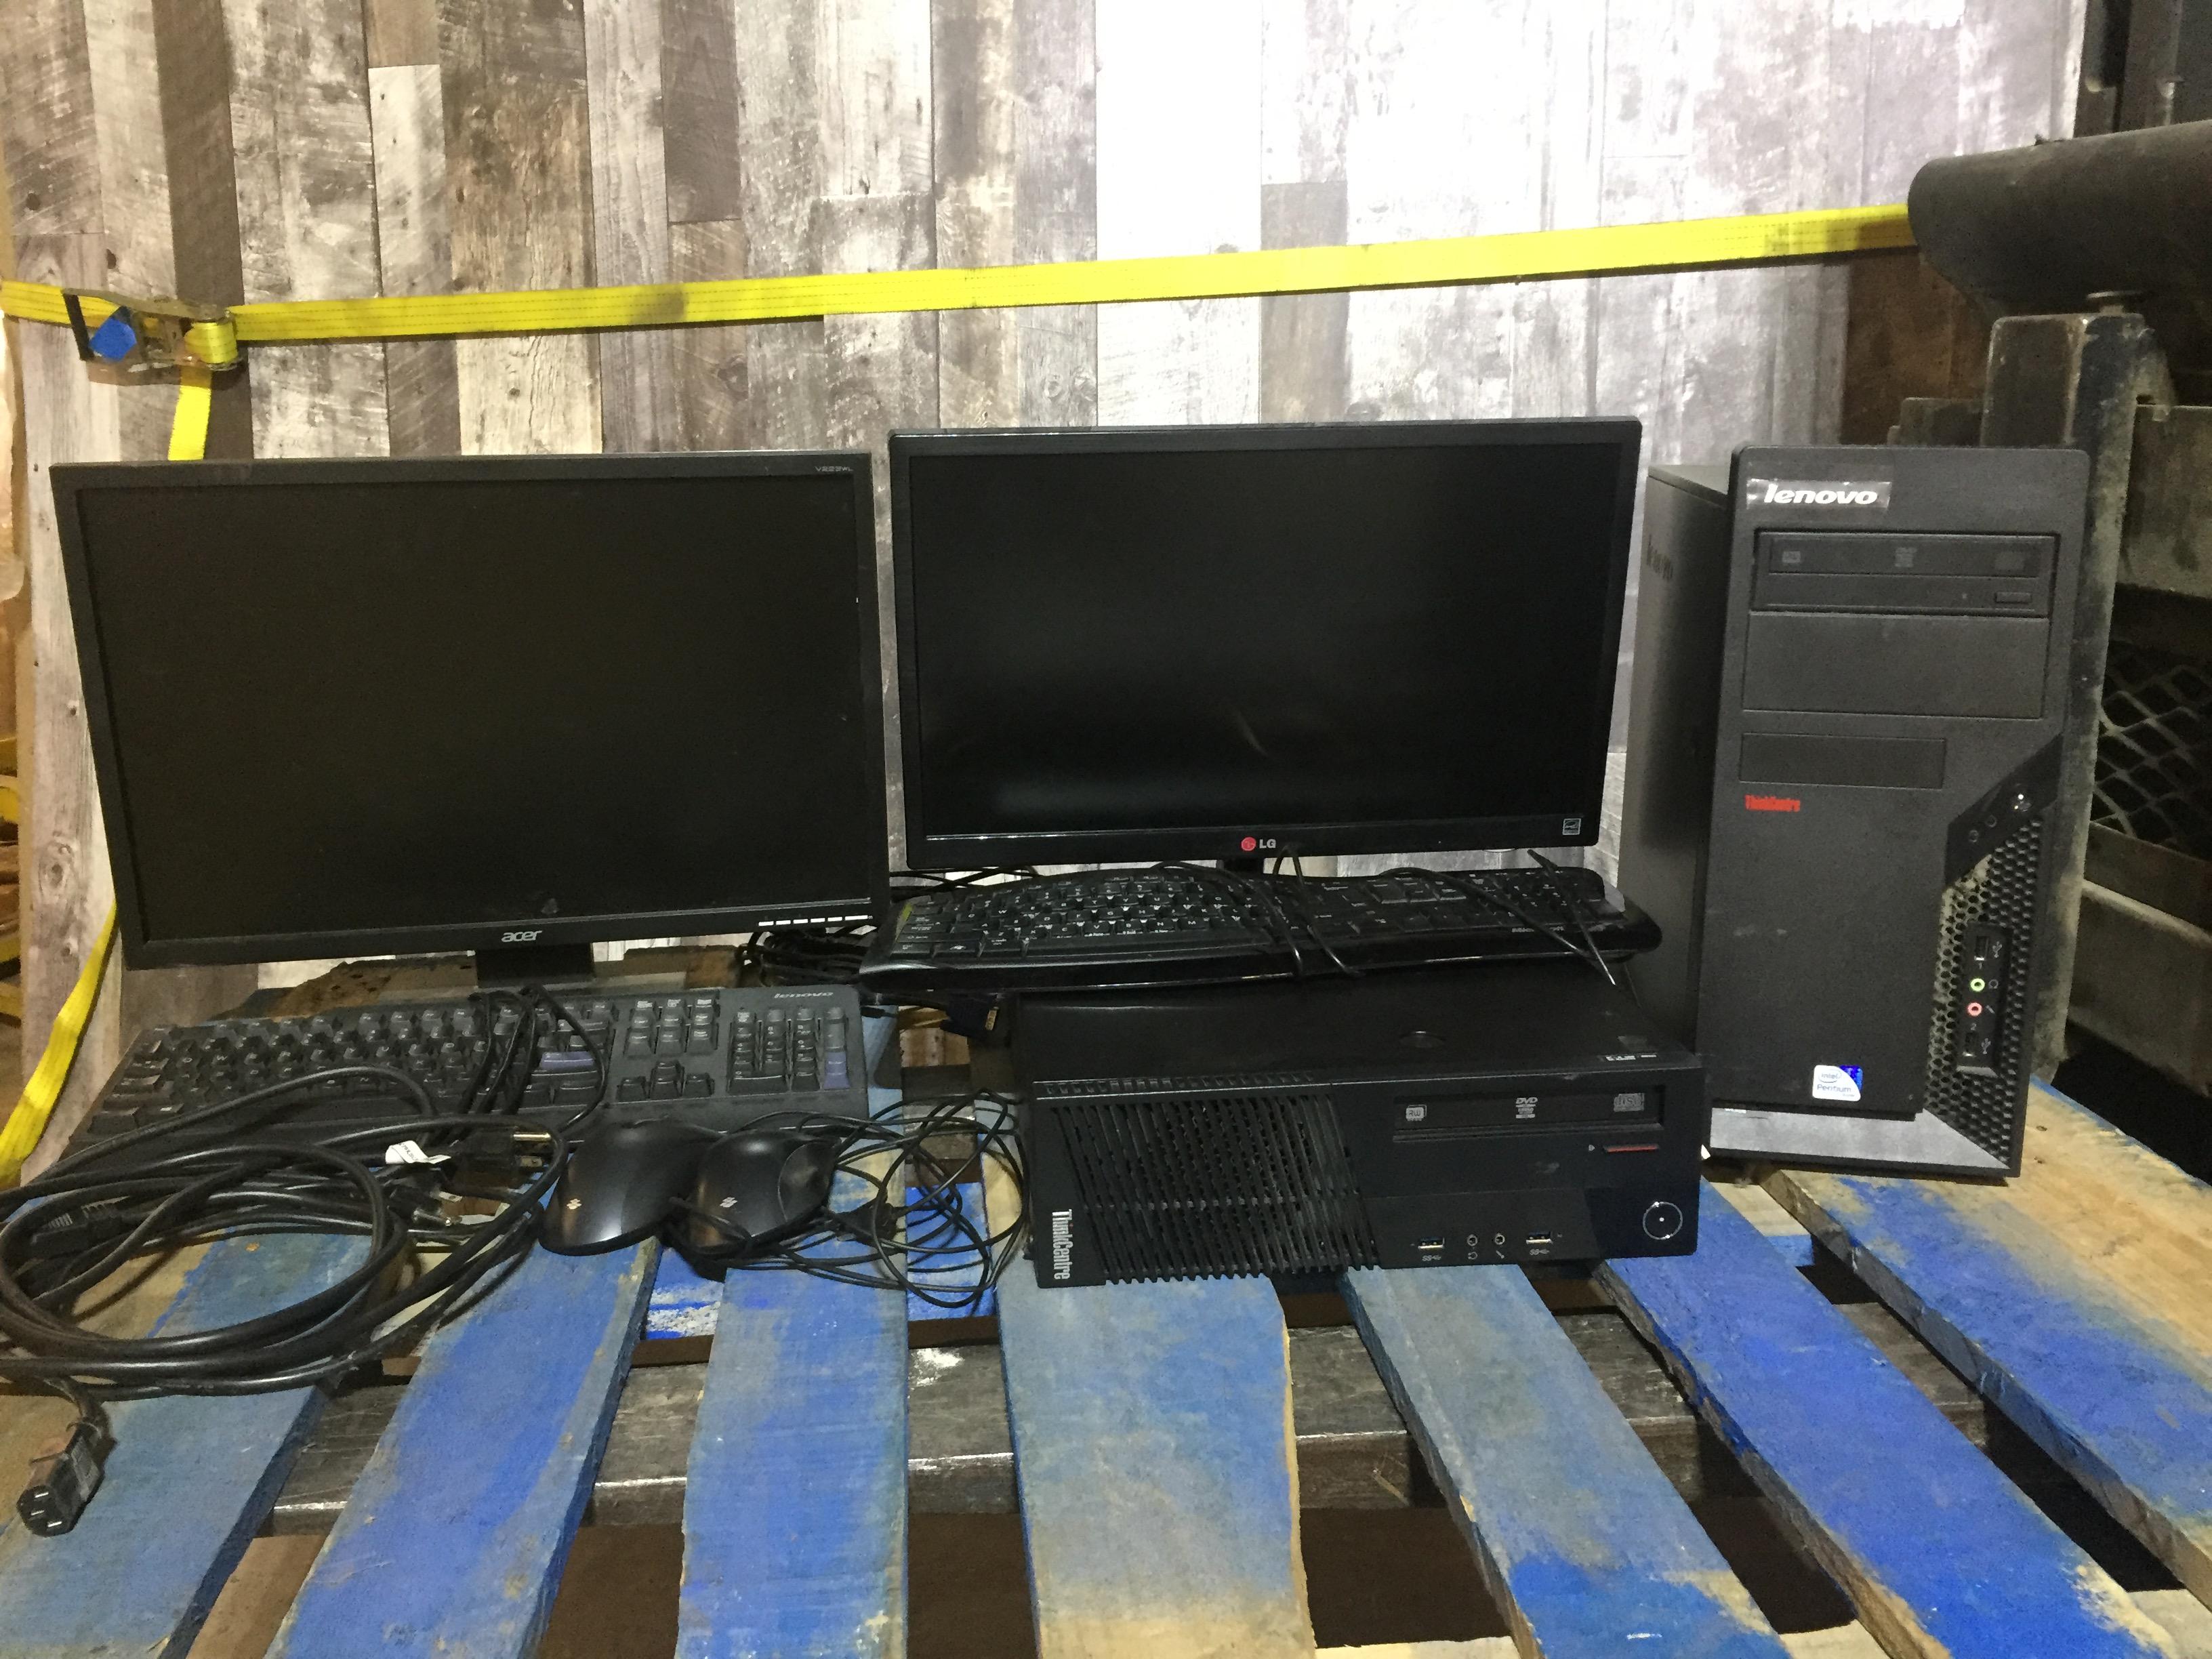 1 ACER COMPUTER MONITOR, 1 LG COMPUTER MONITOR, 2 KEYBOARDS, 2 MICE, 1 LENOVO THINKCENTRE DESKTOP, 1